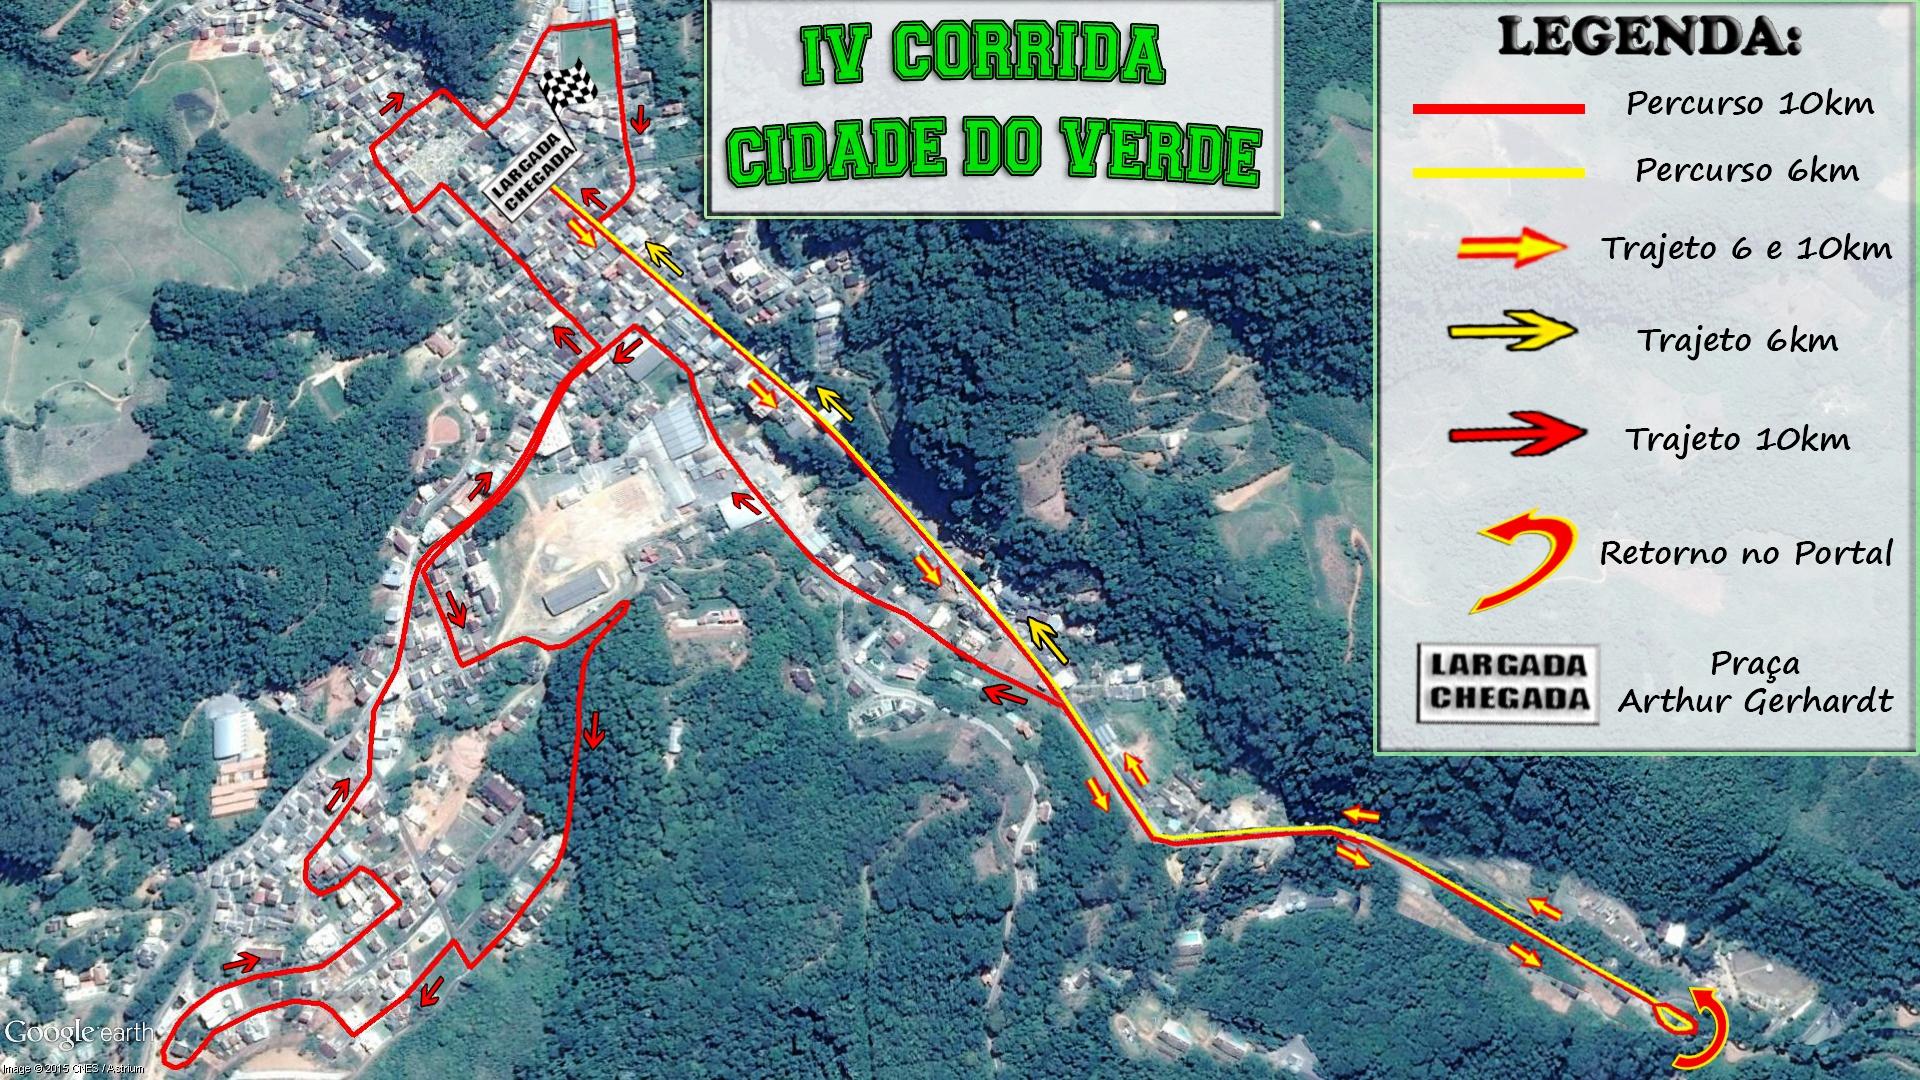 mapa_percurso_iv_corrida_cidade_do_verde